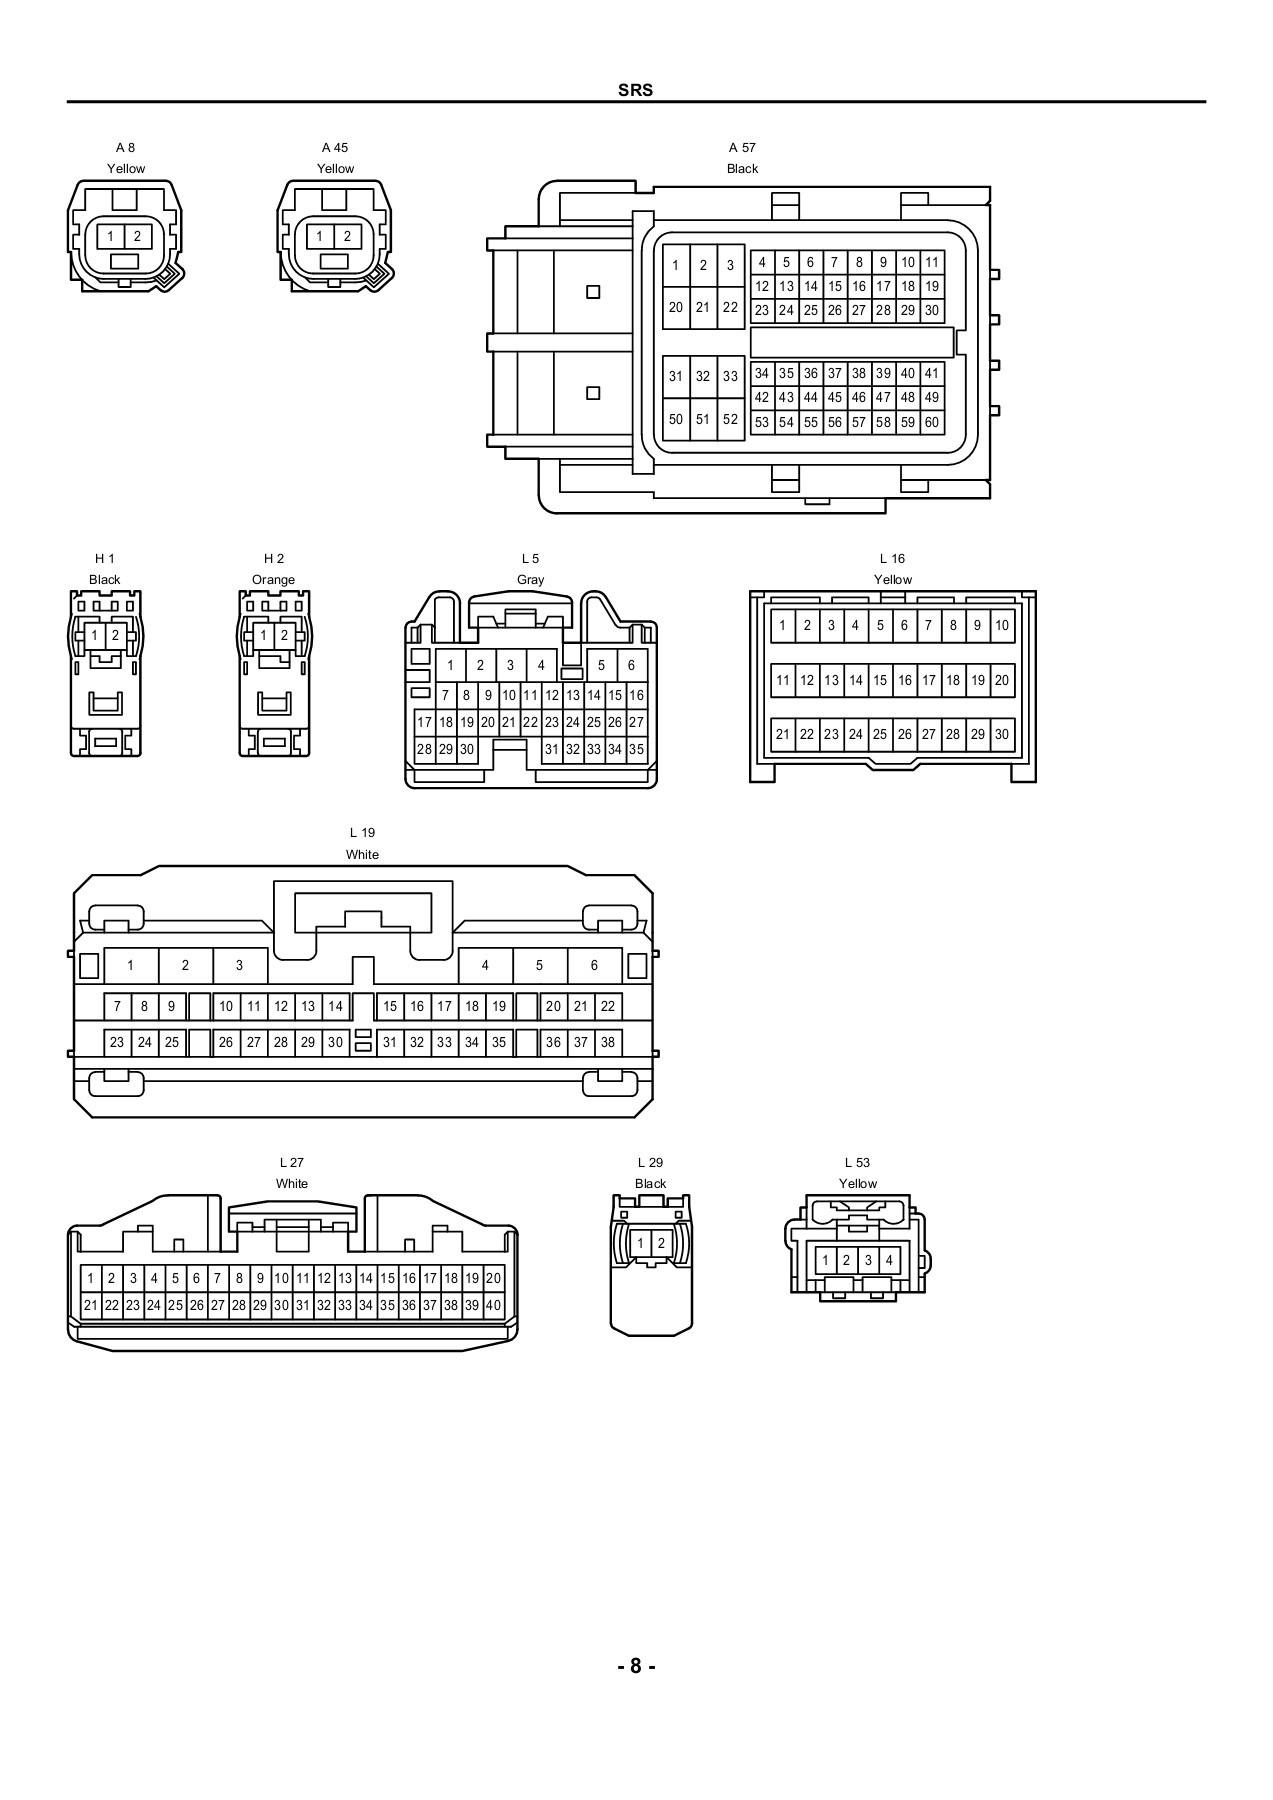 medium resolution of toyota prius 2010 electrical wiring diagrams pages 451 466 text toyota prius 2010 electrical wiring diagrams